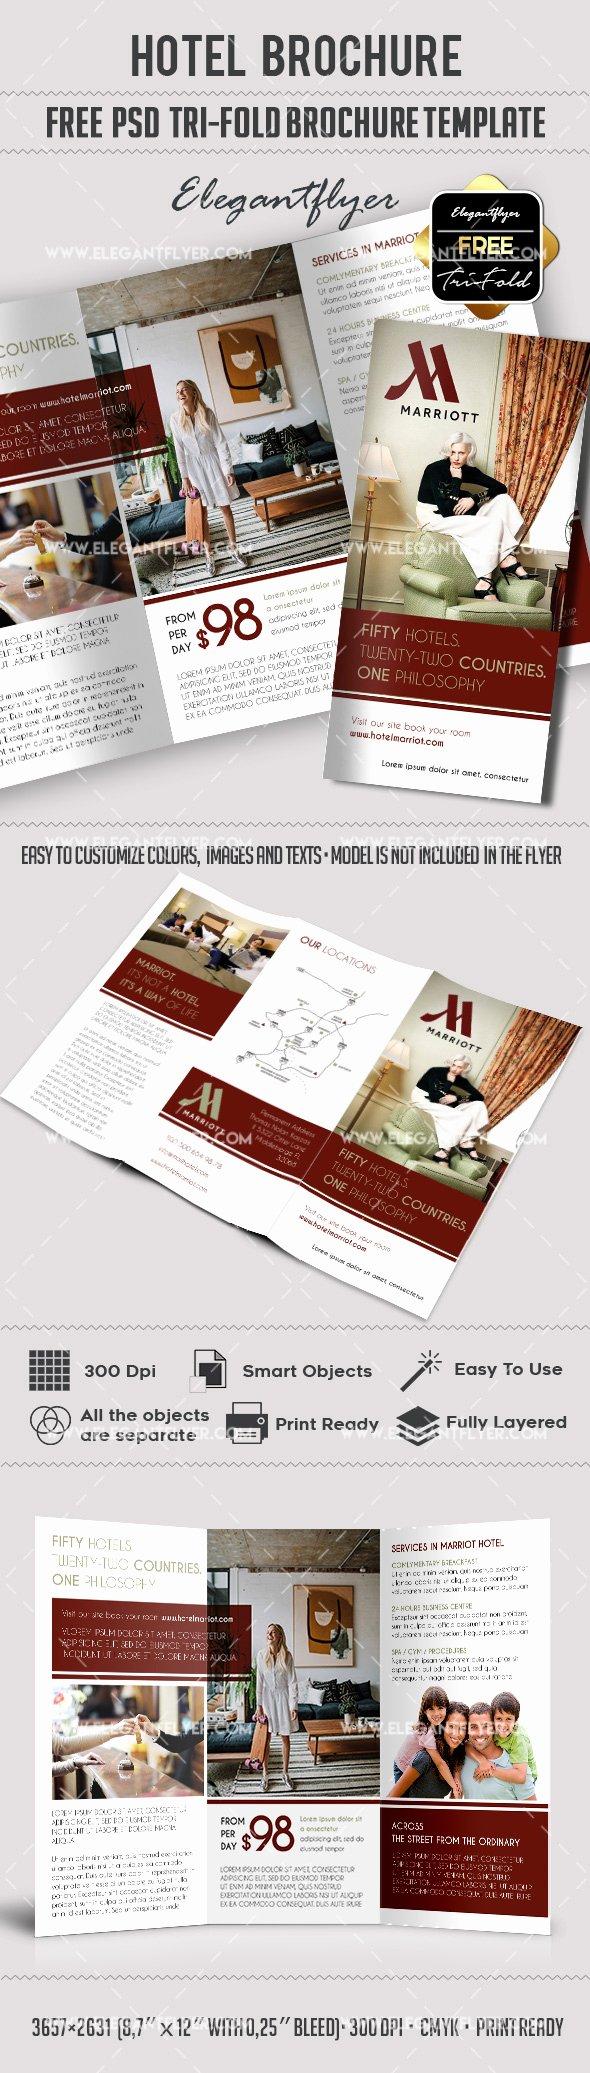 Free Hotel – Free Psd Tri Fold Psd Brochure Template Flyer